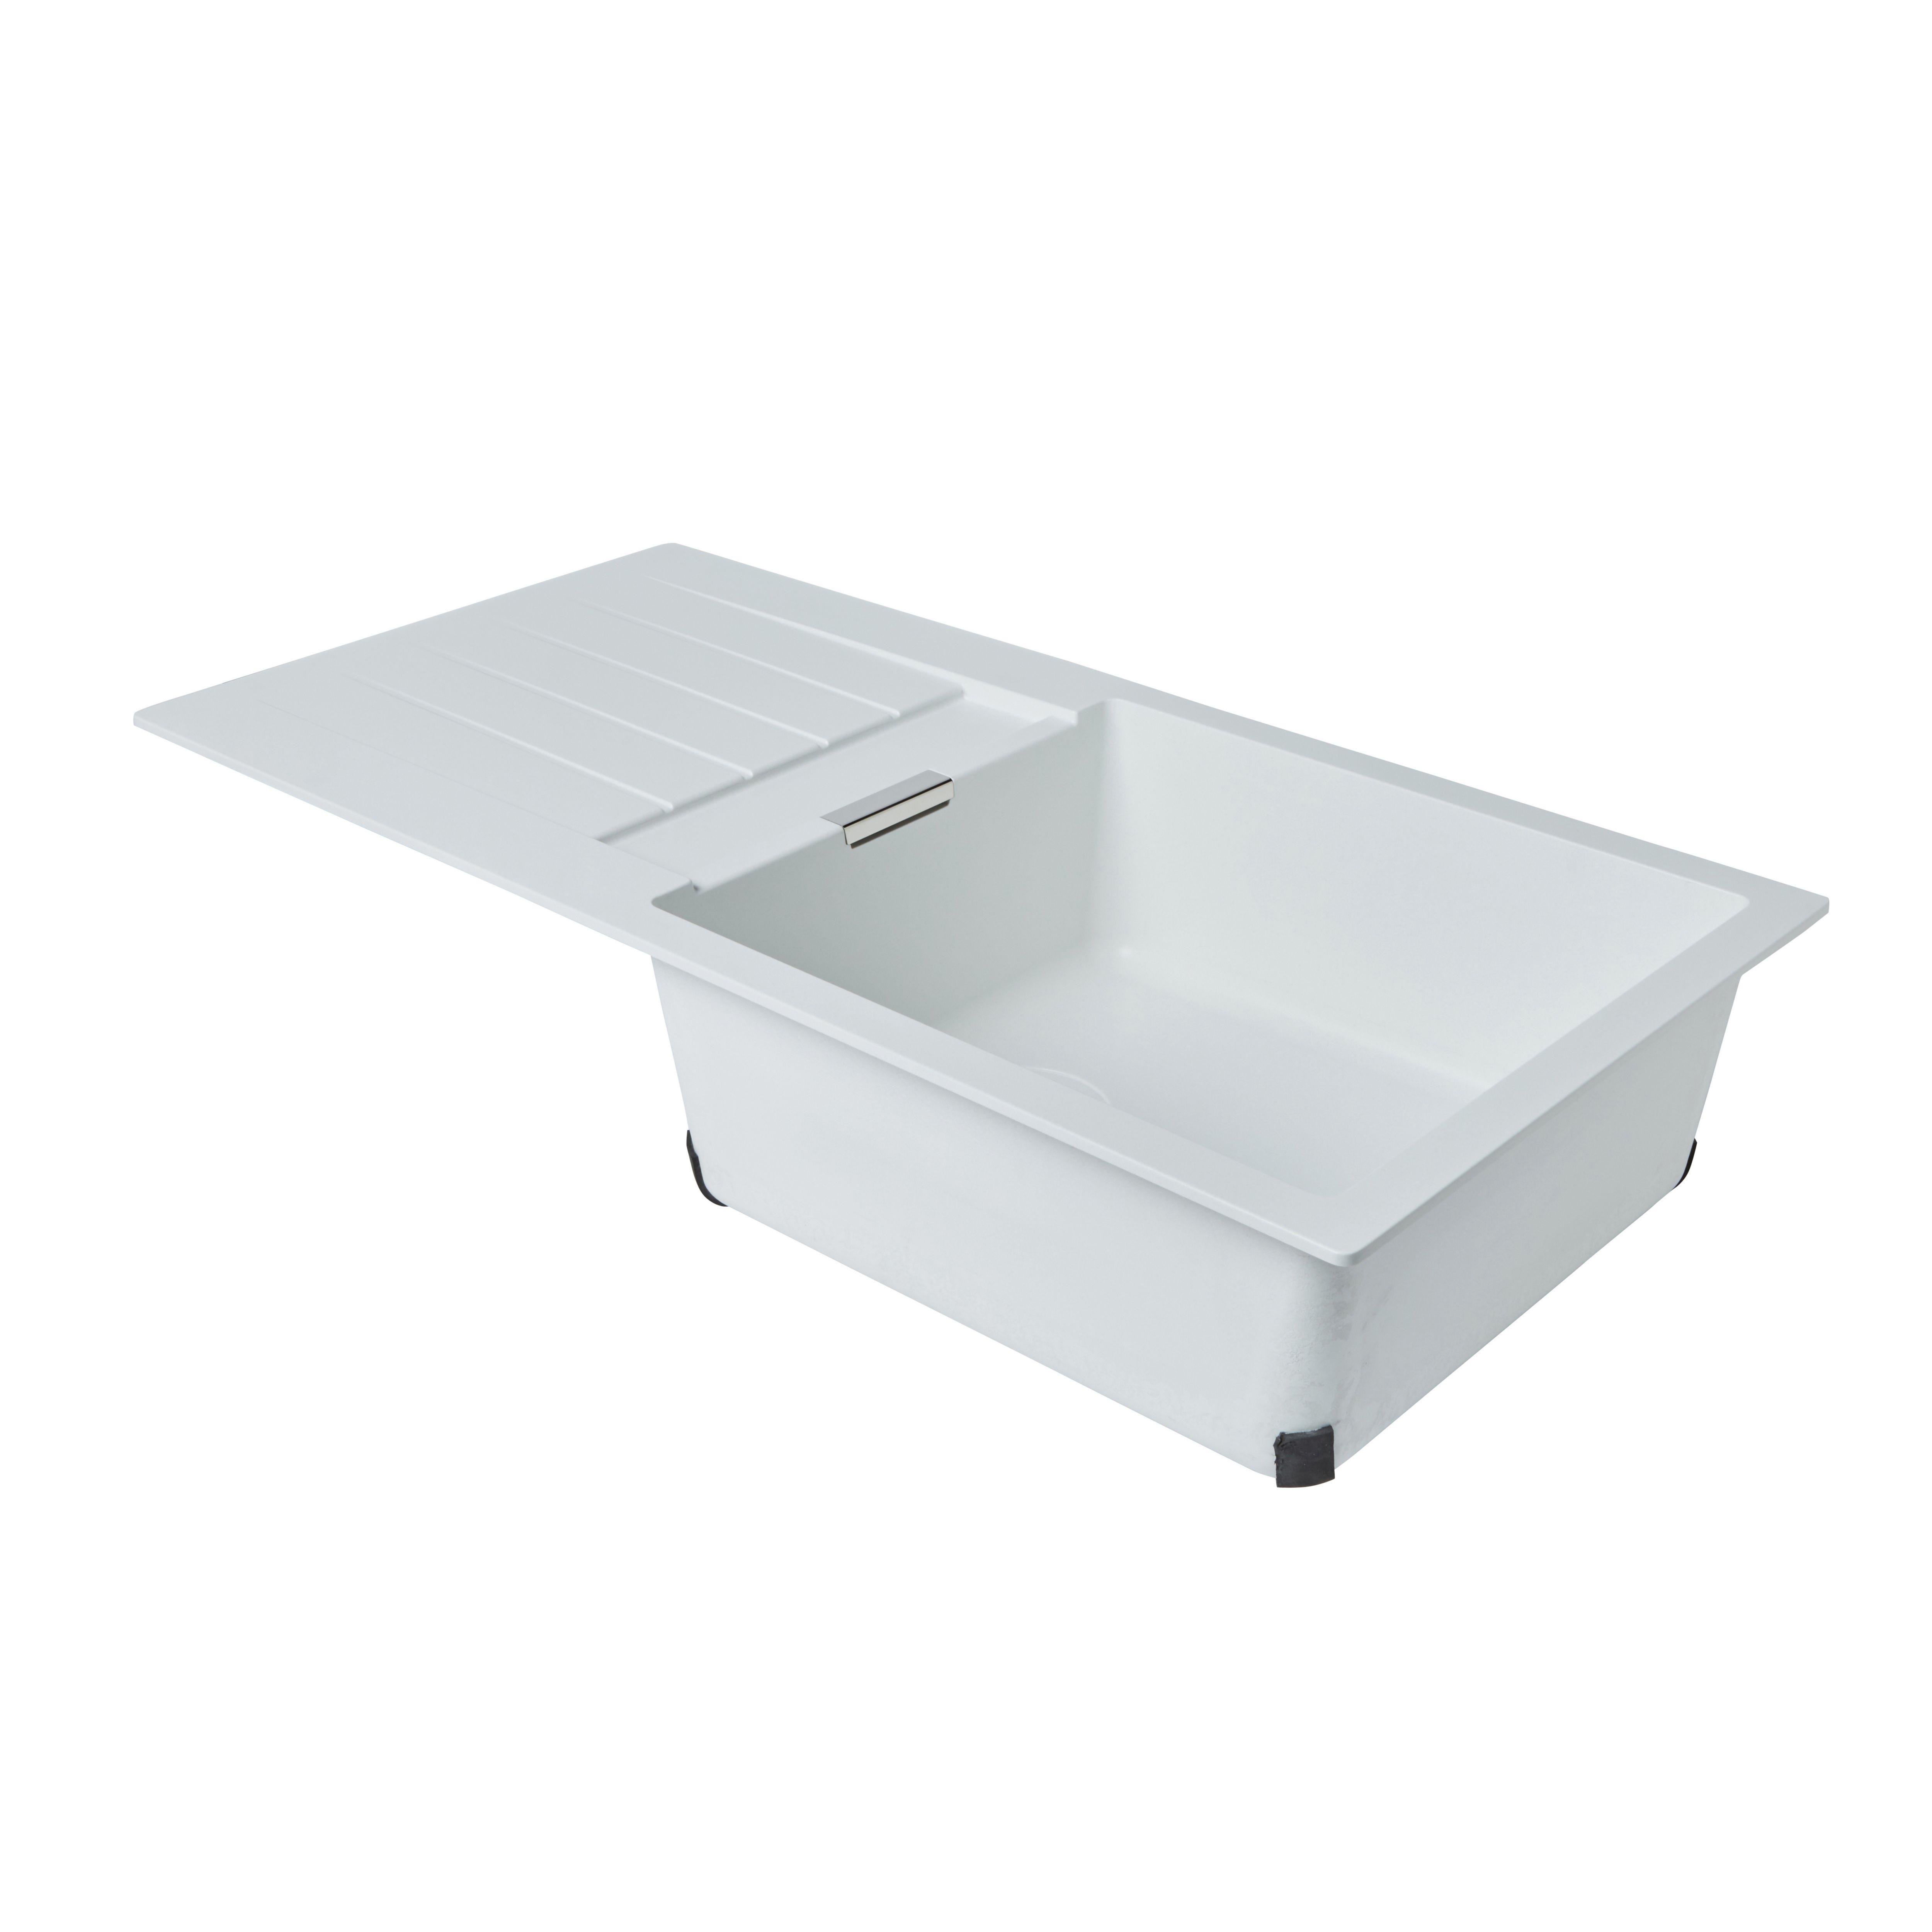 Cif power amp shine bathroom - Cooke Lewis Galvani 1 Bowl White Composite Quartz Sink Drainer Departments Diy At B Q